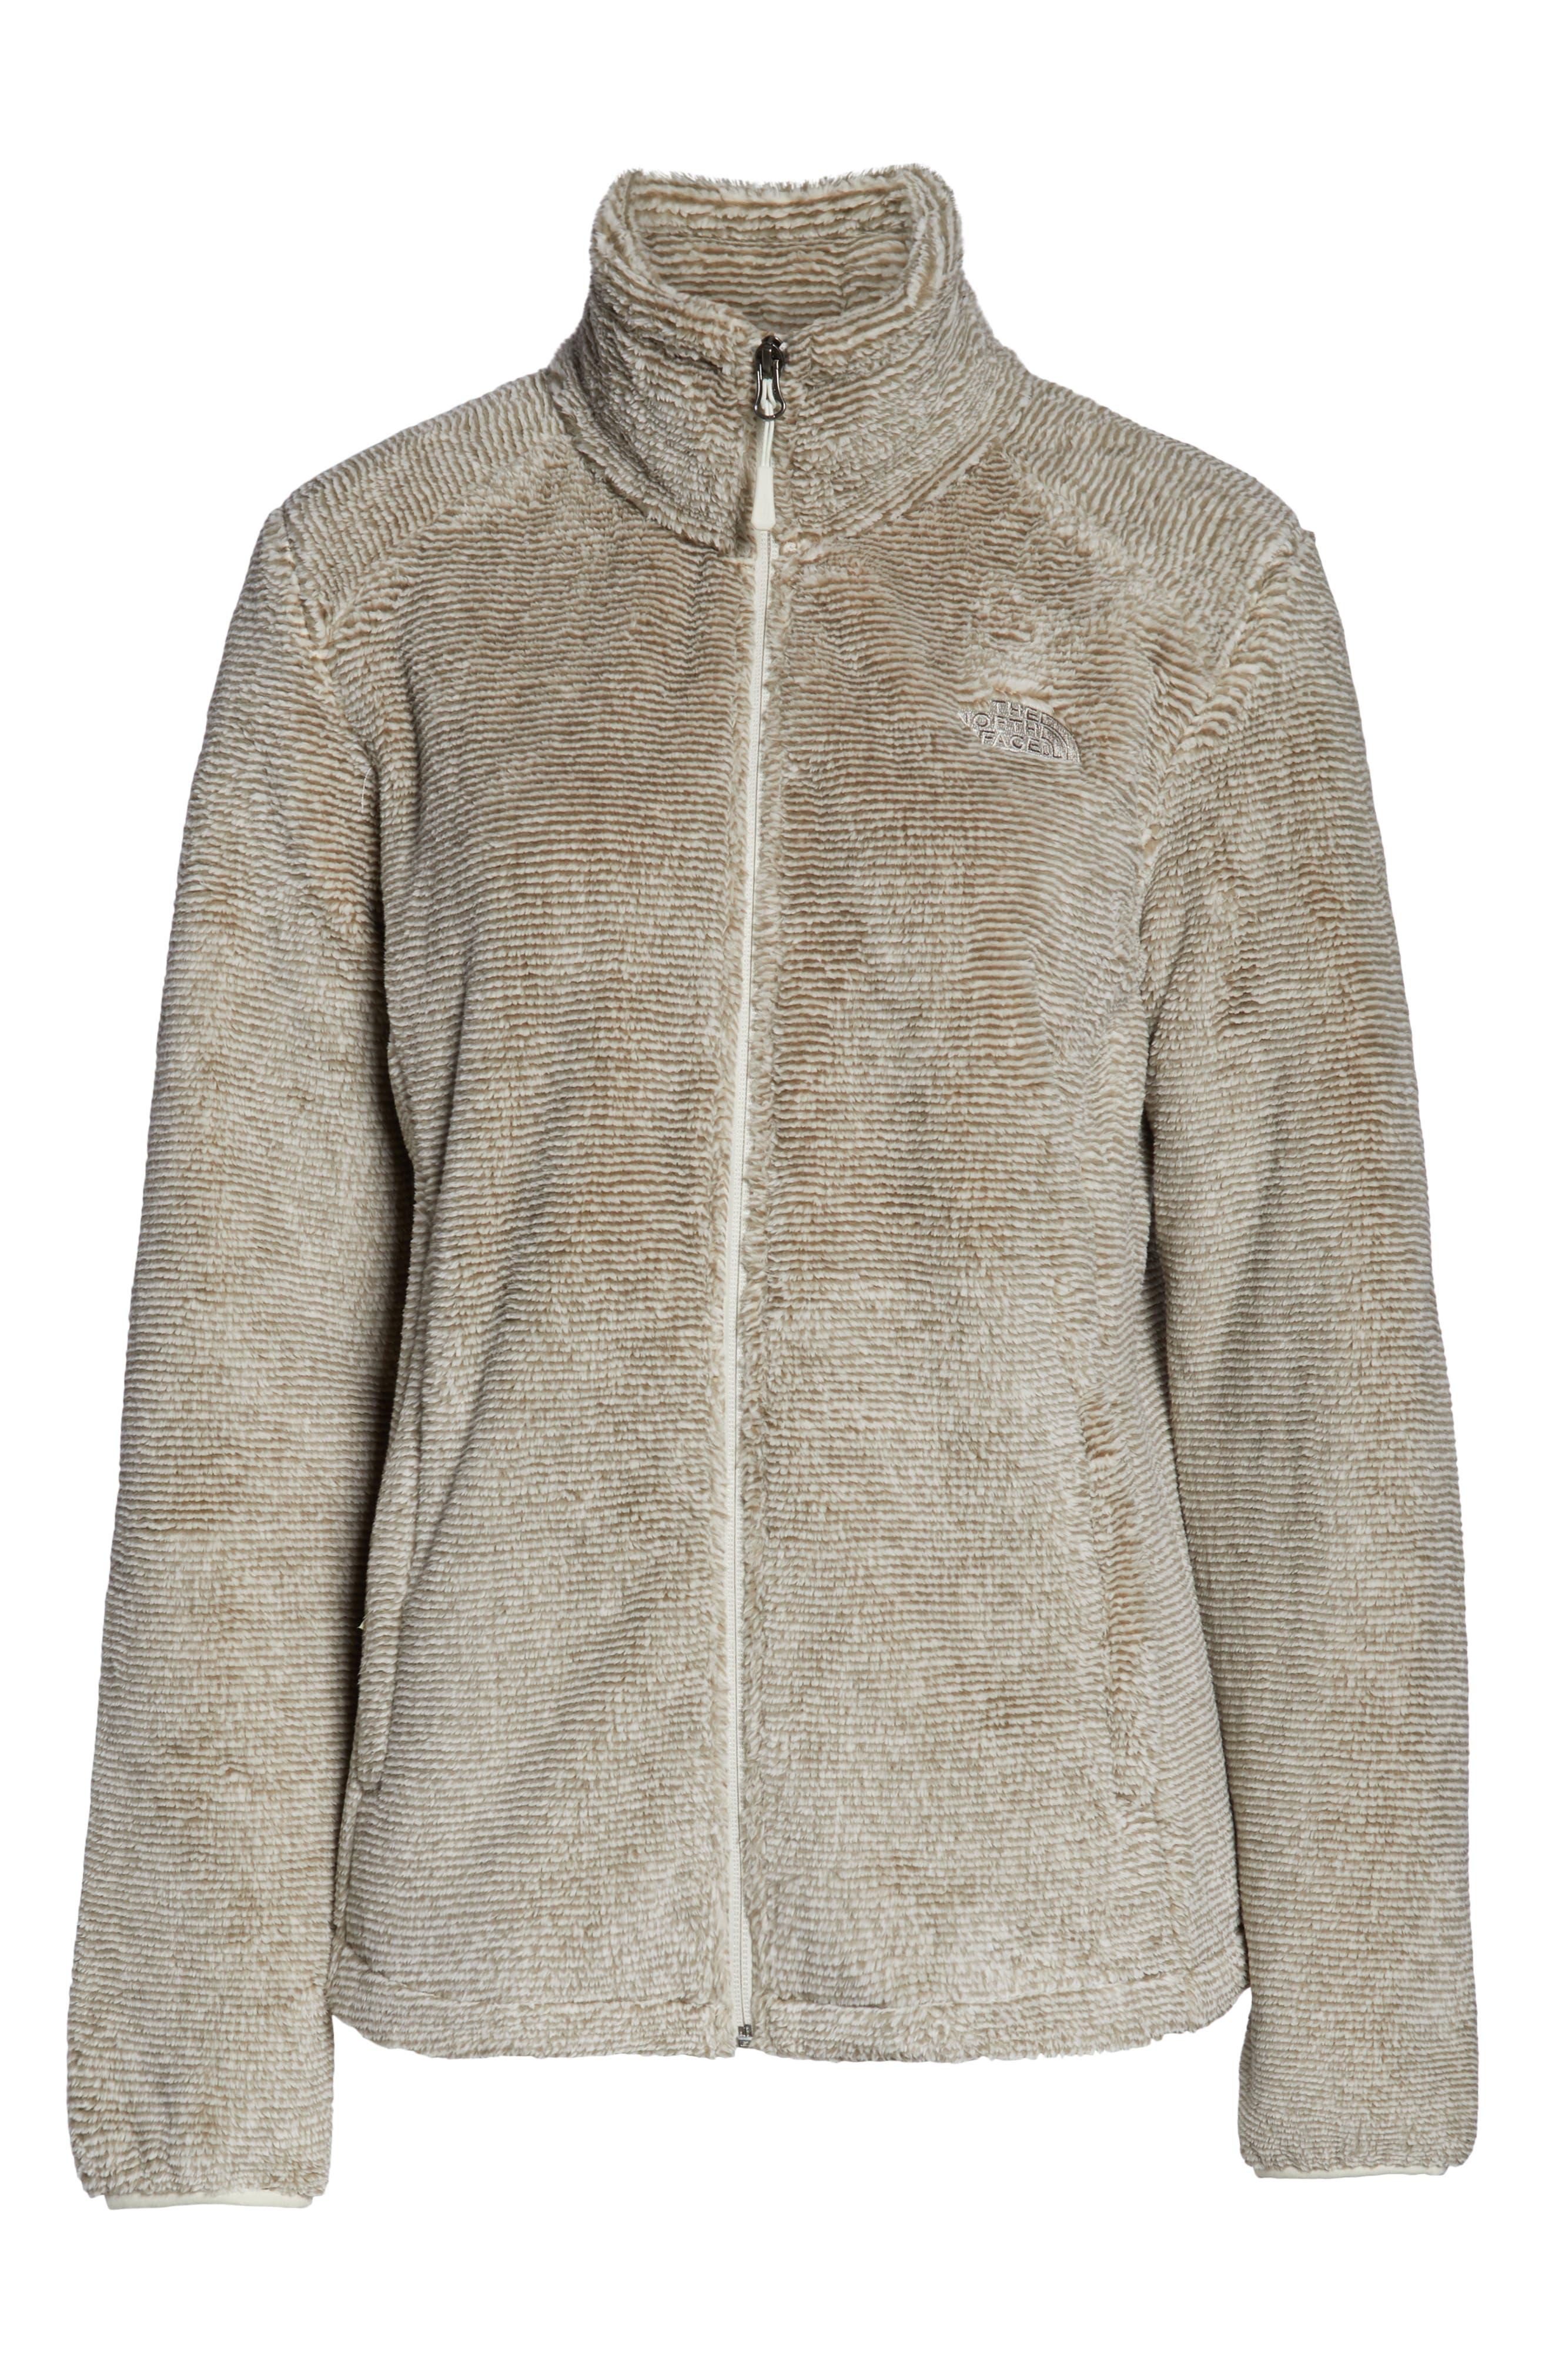 THE NORTH FACE, Osito 2 Stripe Fleece Jacket, Alternate thumbnail 6, color, GREY/ VINTAGE WHITE STRIPE